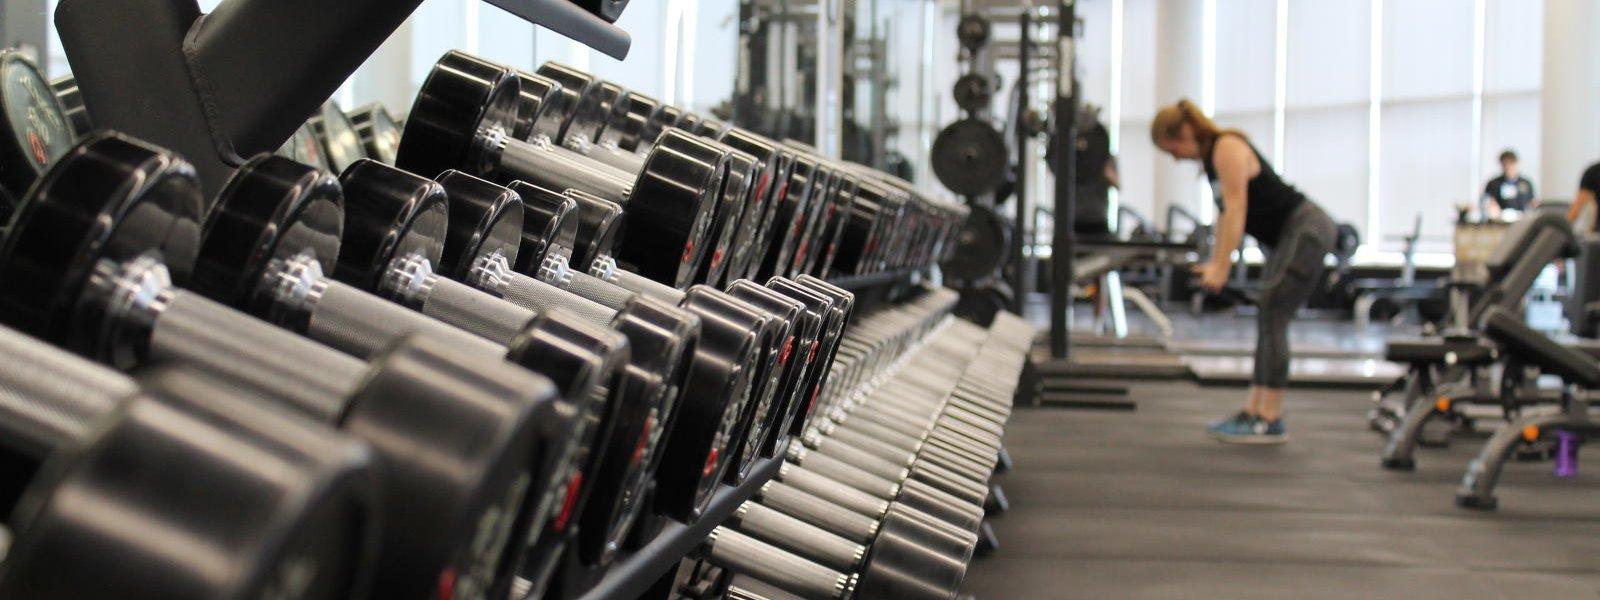 SEO Case Study Pinnacle Fitness